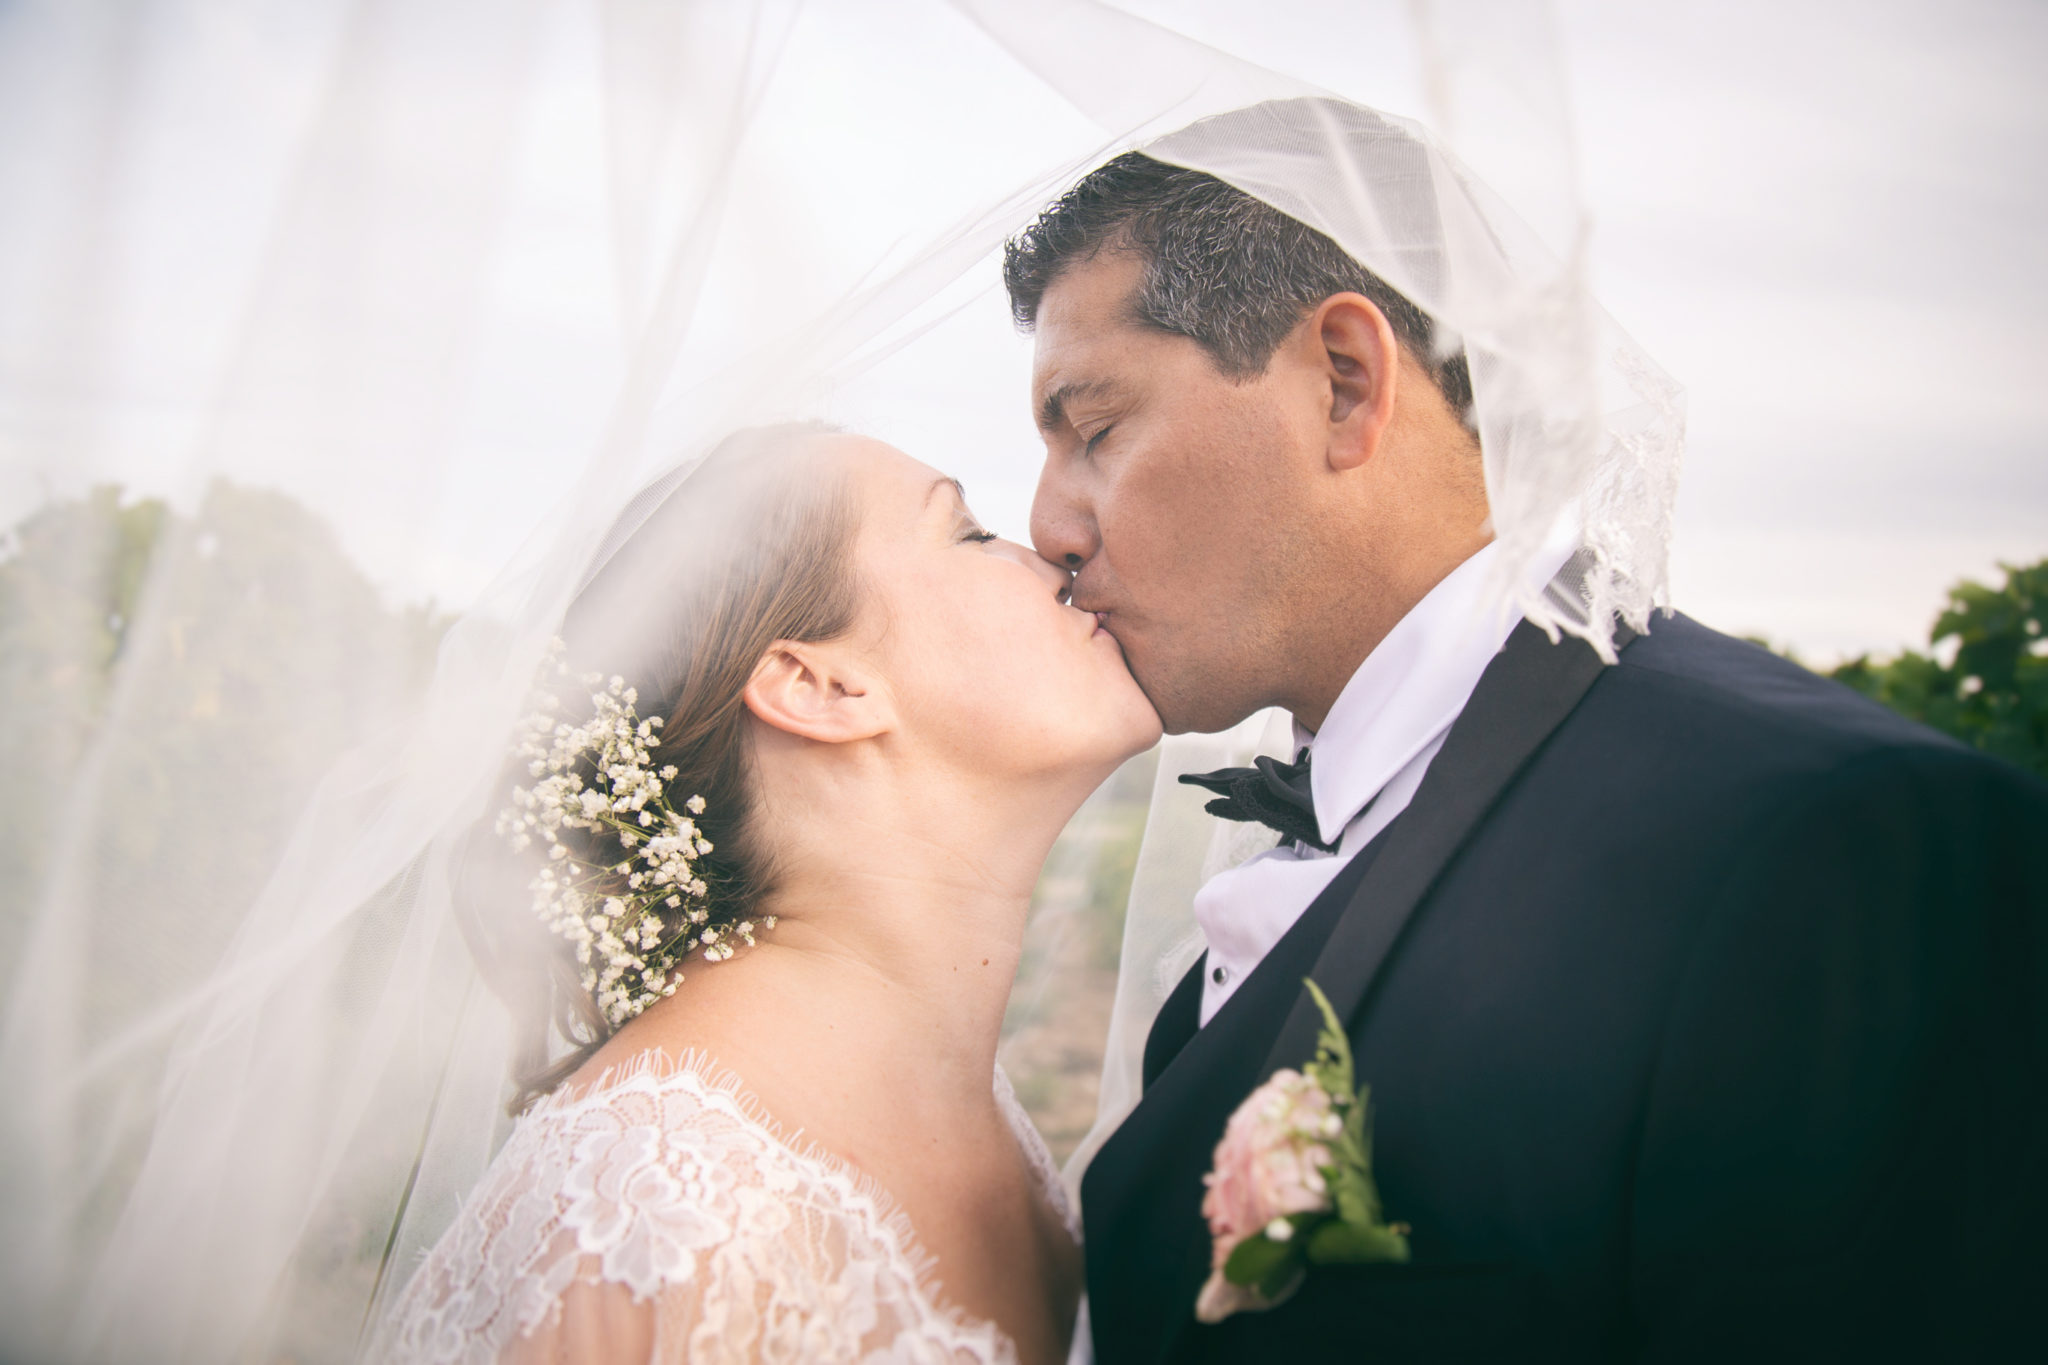 photographe mariage shooting couple eternel present